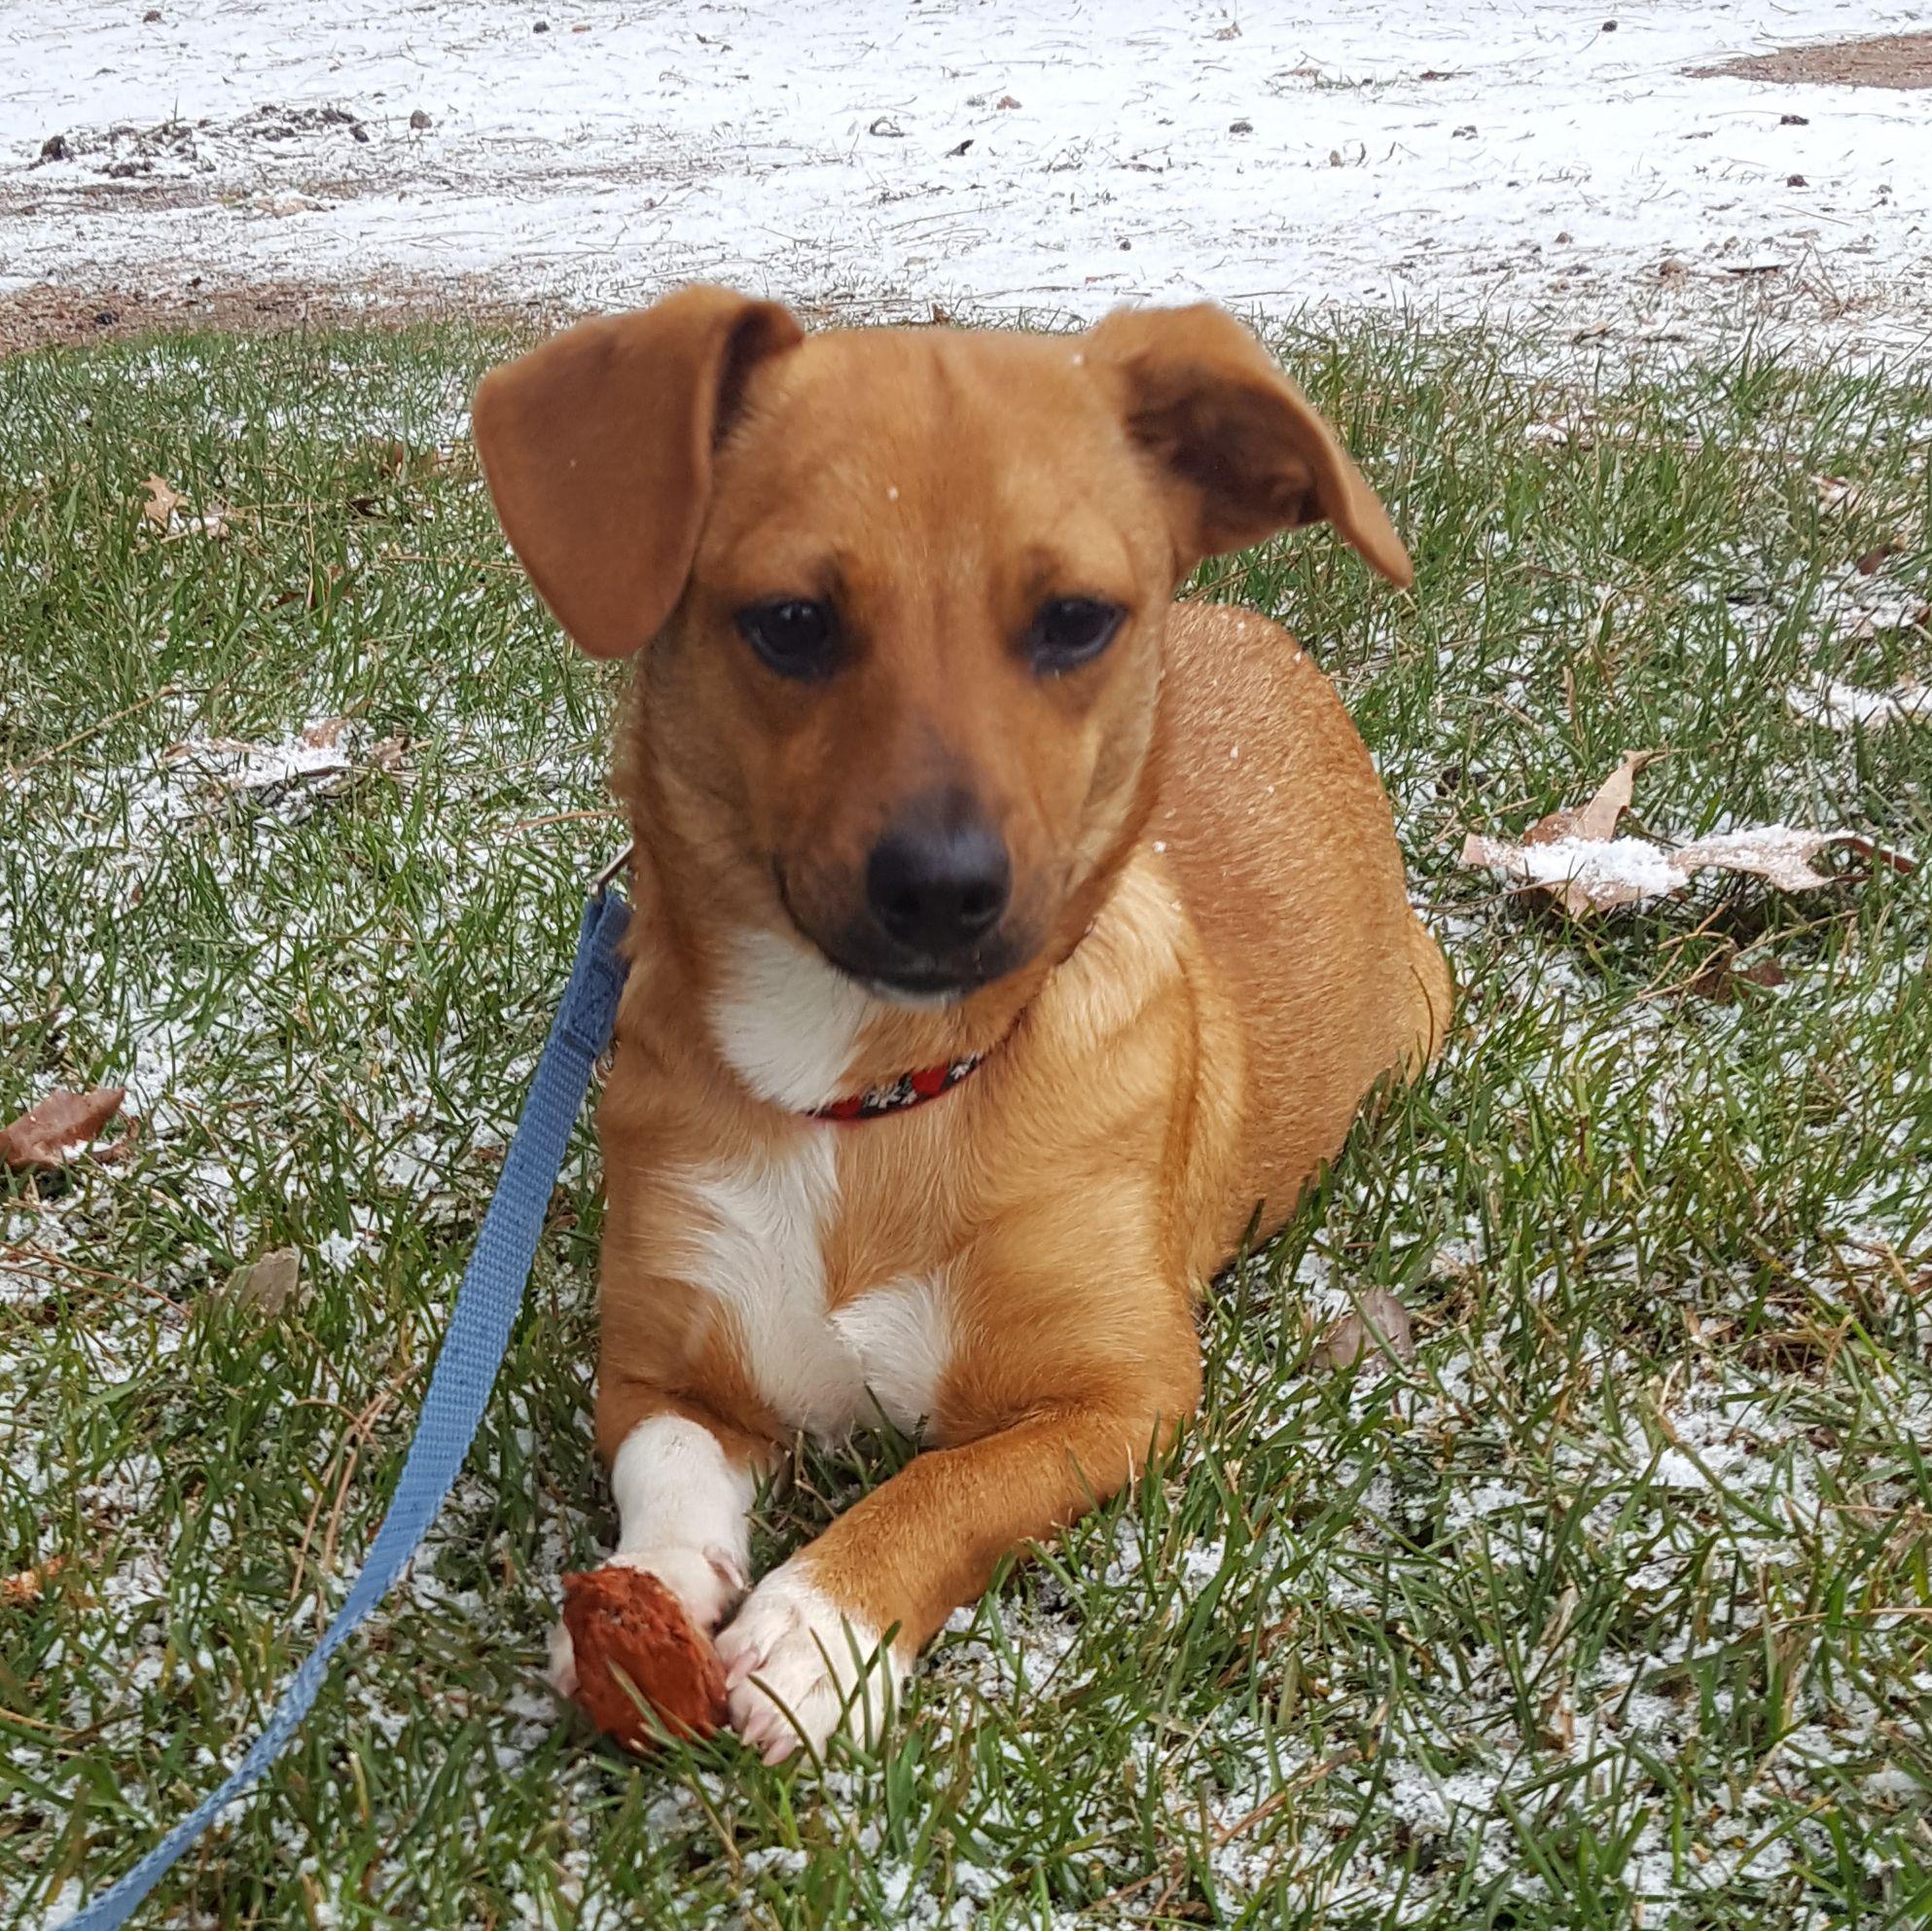 Chiweenie dog for Adoption in St. Louis Park, MN. ADN